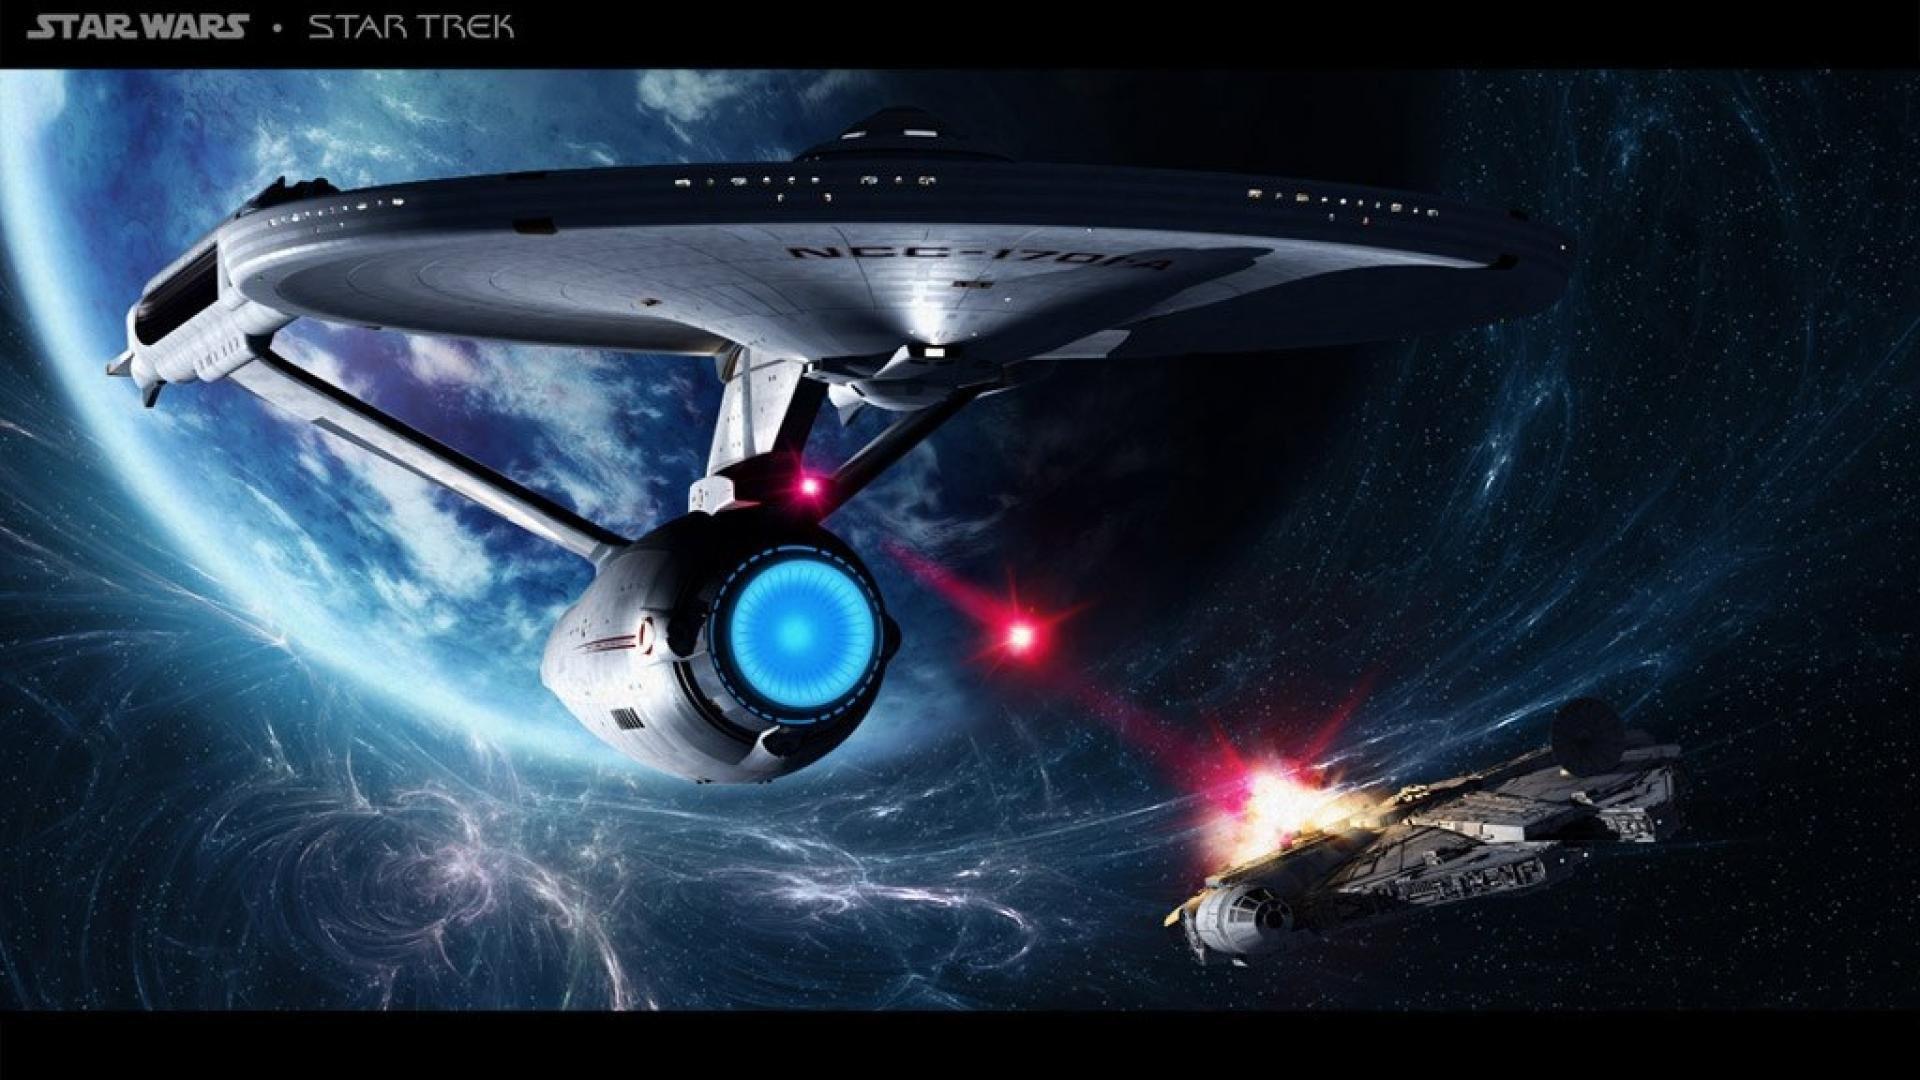 Star Trek Into Darkness Movie Wallpapers | HD Wallpapers